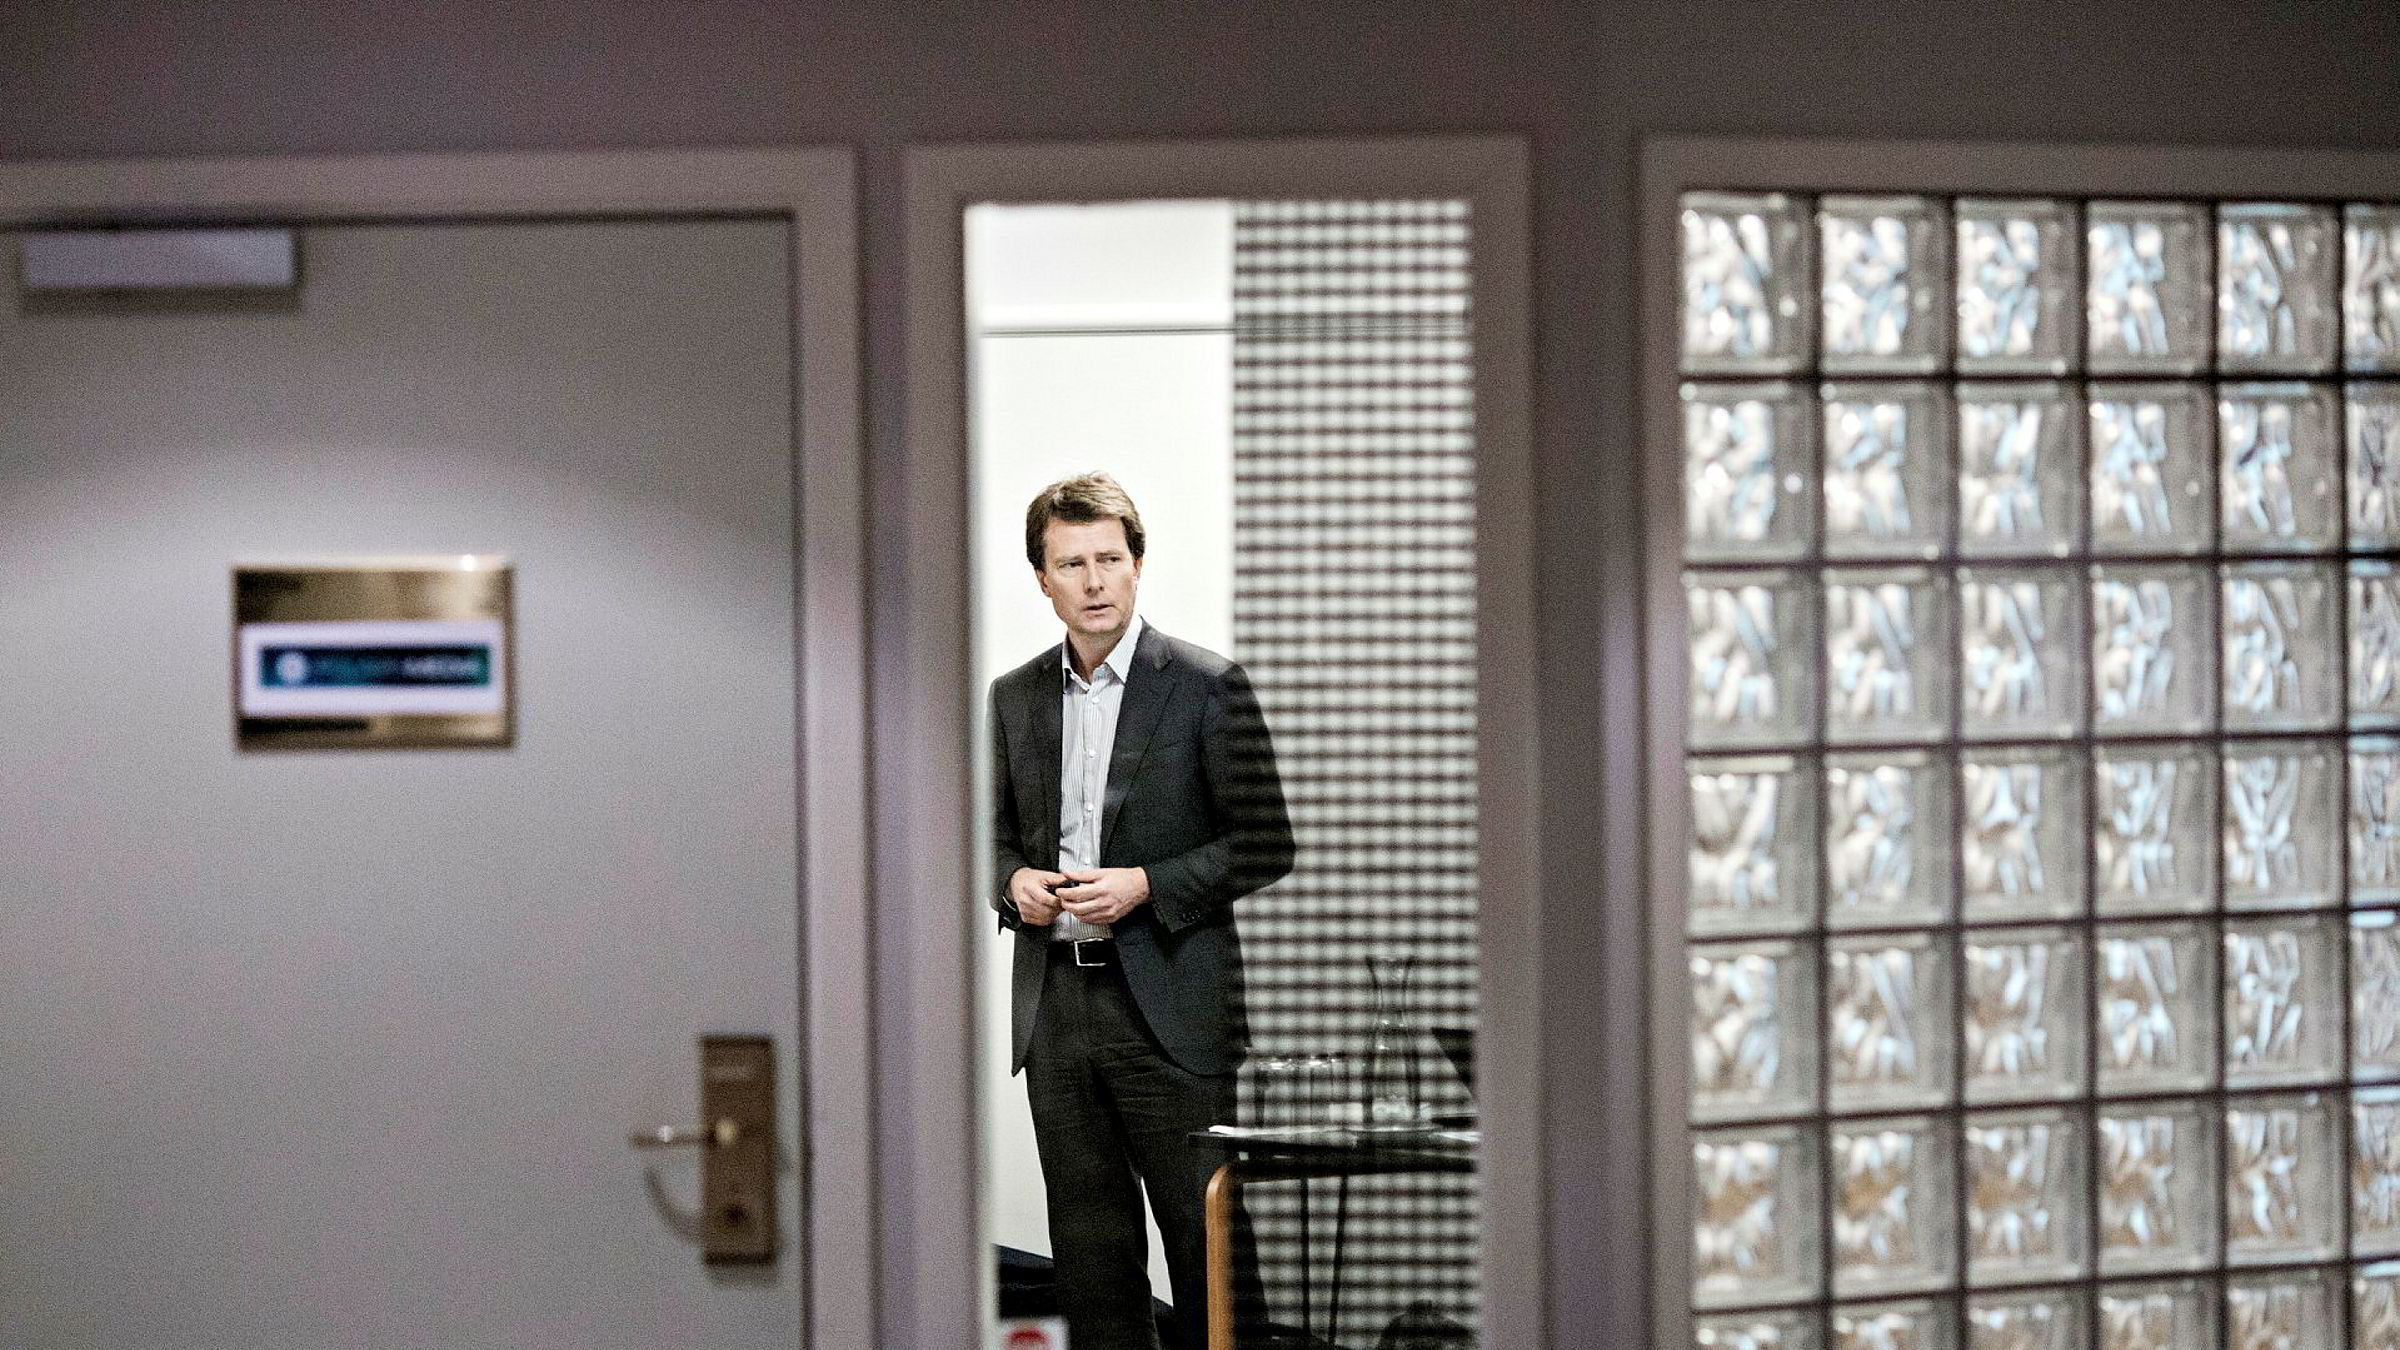 Konsernsjef Per Axel Koch i Polaris Media presenterer vekst i årets tredje kvartal. Her fra Polaris-konsernets Q3-presentasjon i fjor.